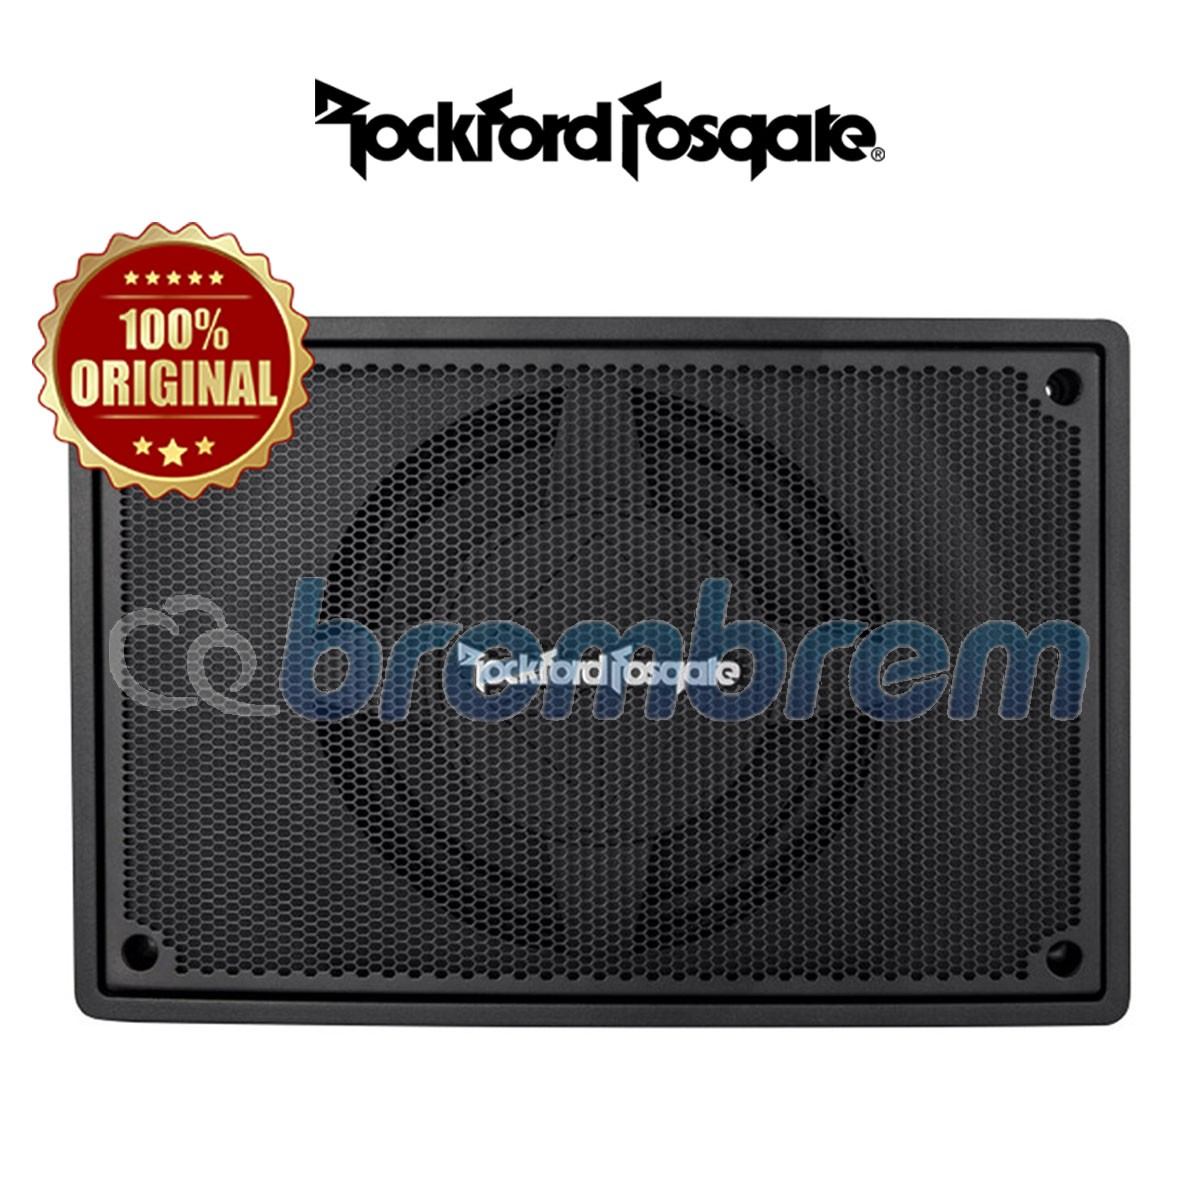 ROCKFORD FOSGATE PS8 - SUBWOOFER AKTIF [REKOMENDASI]